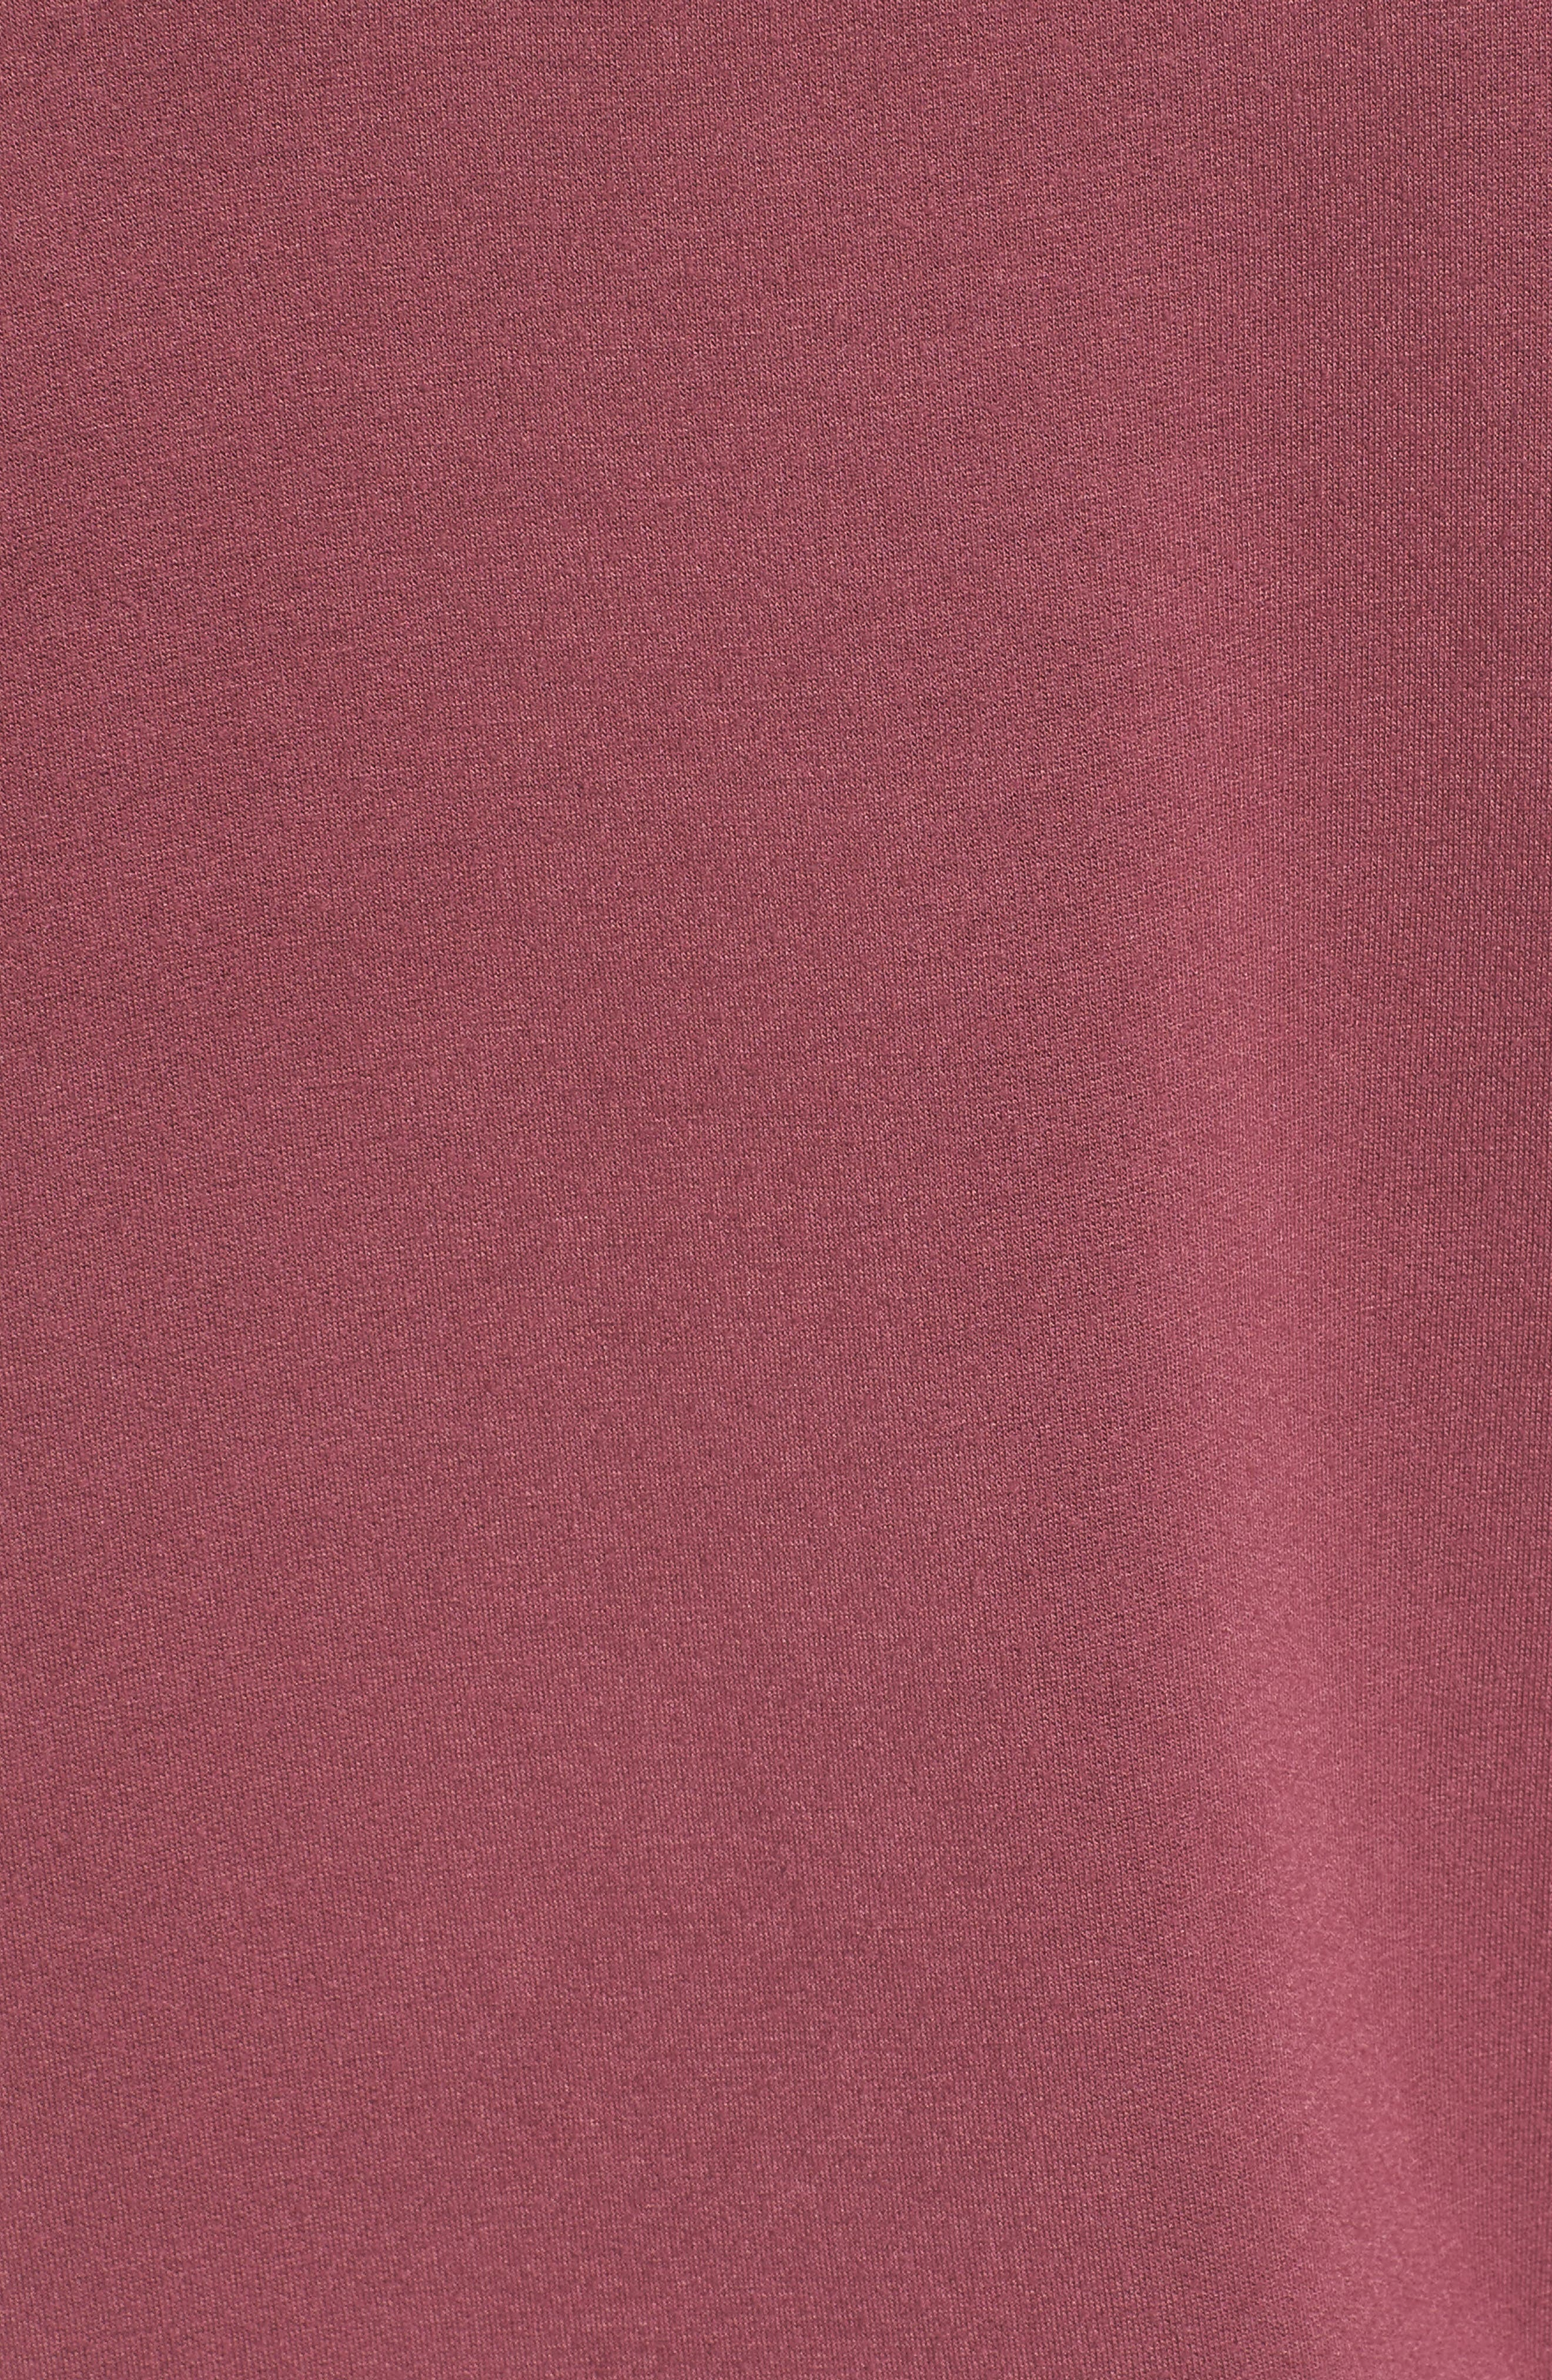 Off the Shoulder Pullover,                             Alternate thumbnail 5, color,                             930